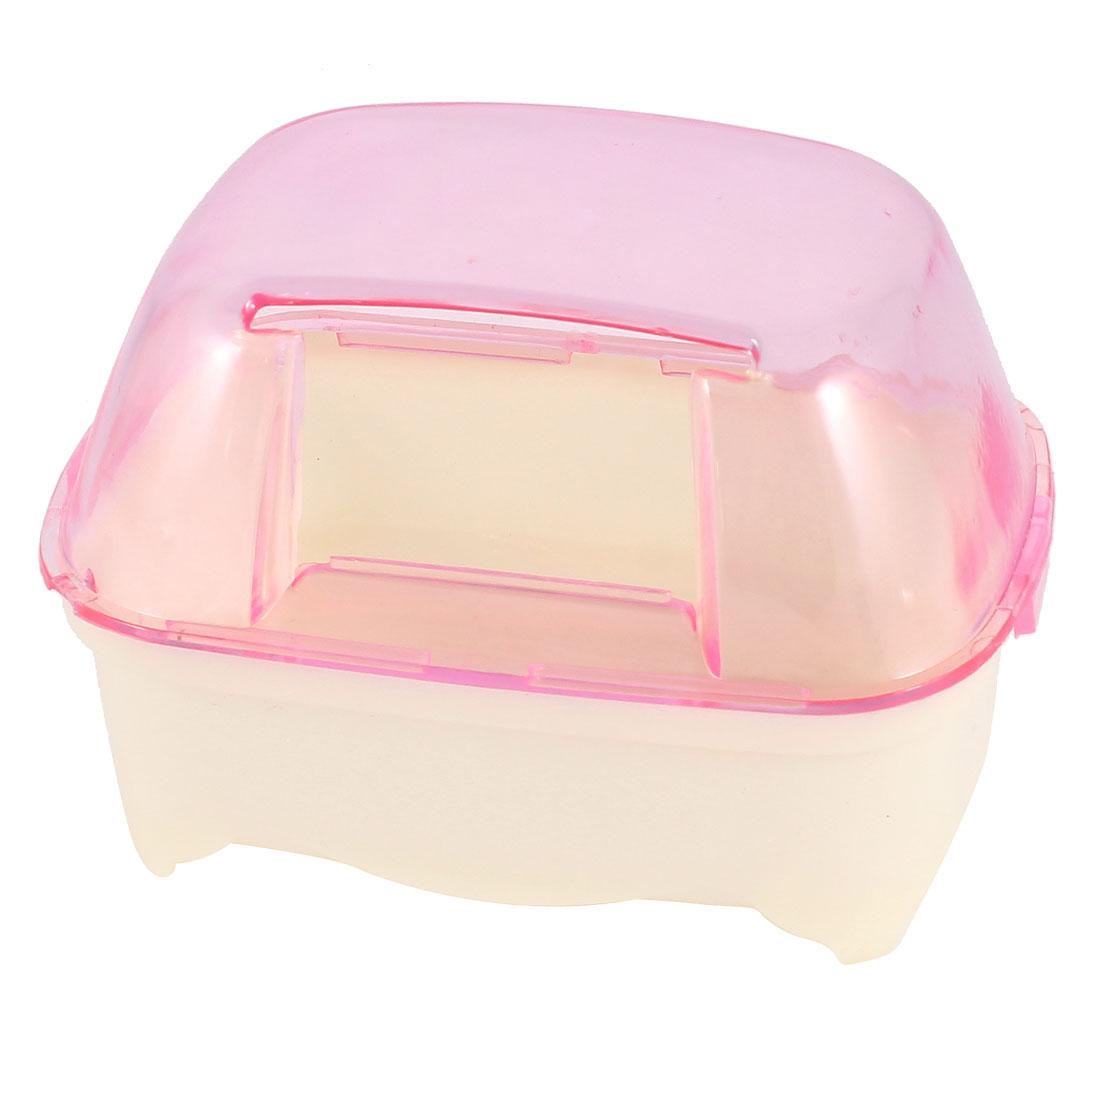 Pet Hamster Bathroom Bathing Sand Room Sauna Cage Clear Pink White